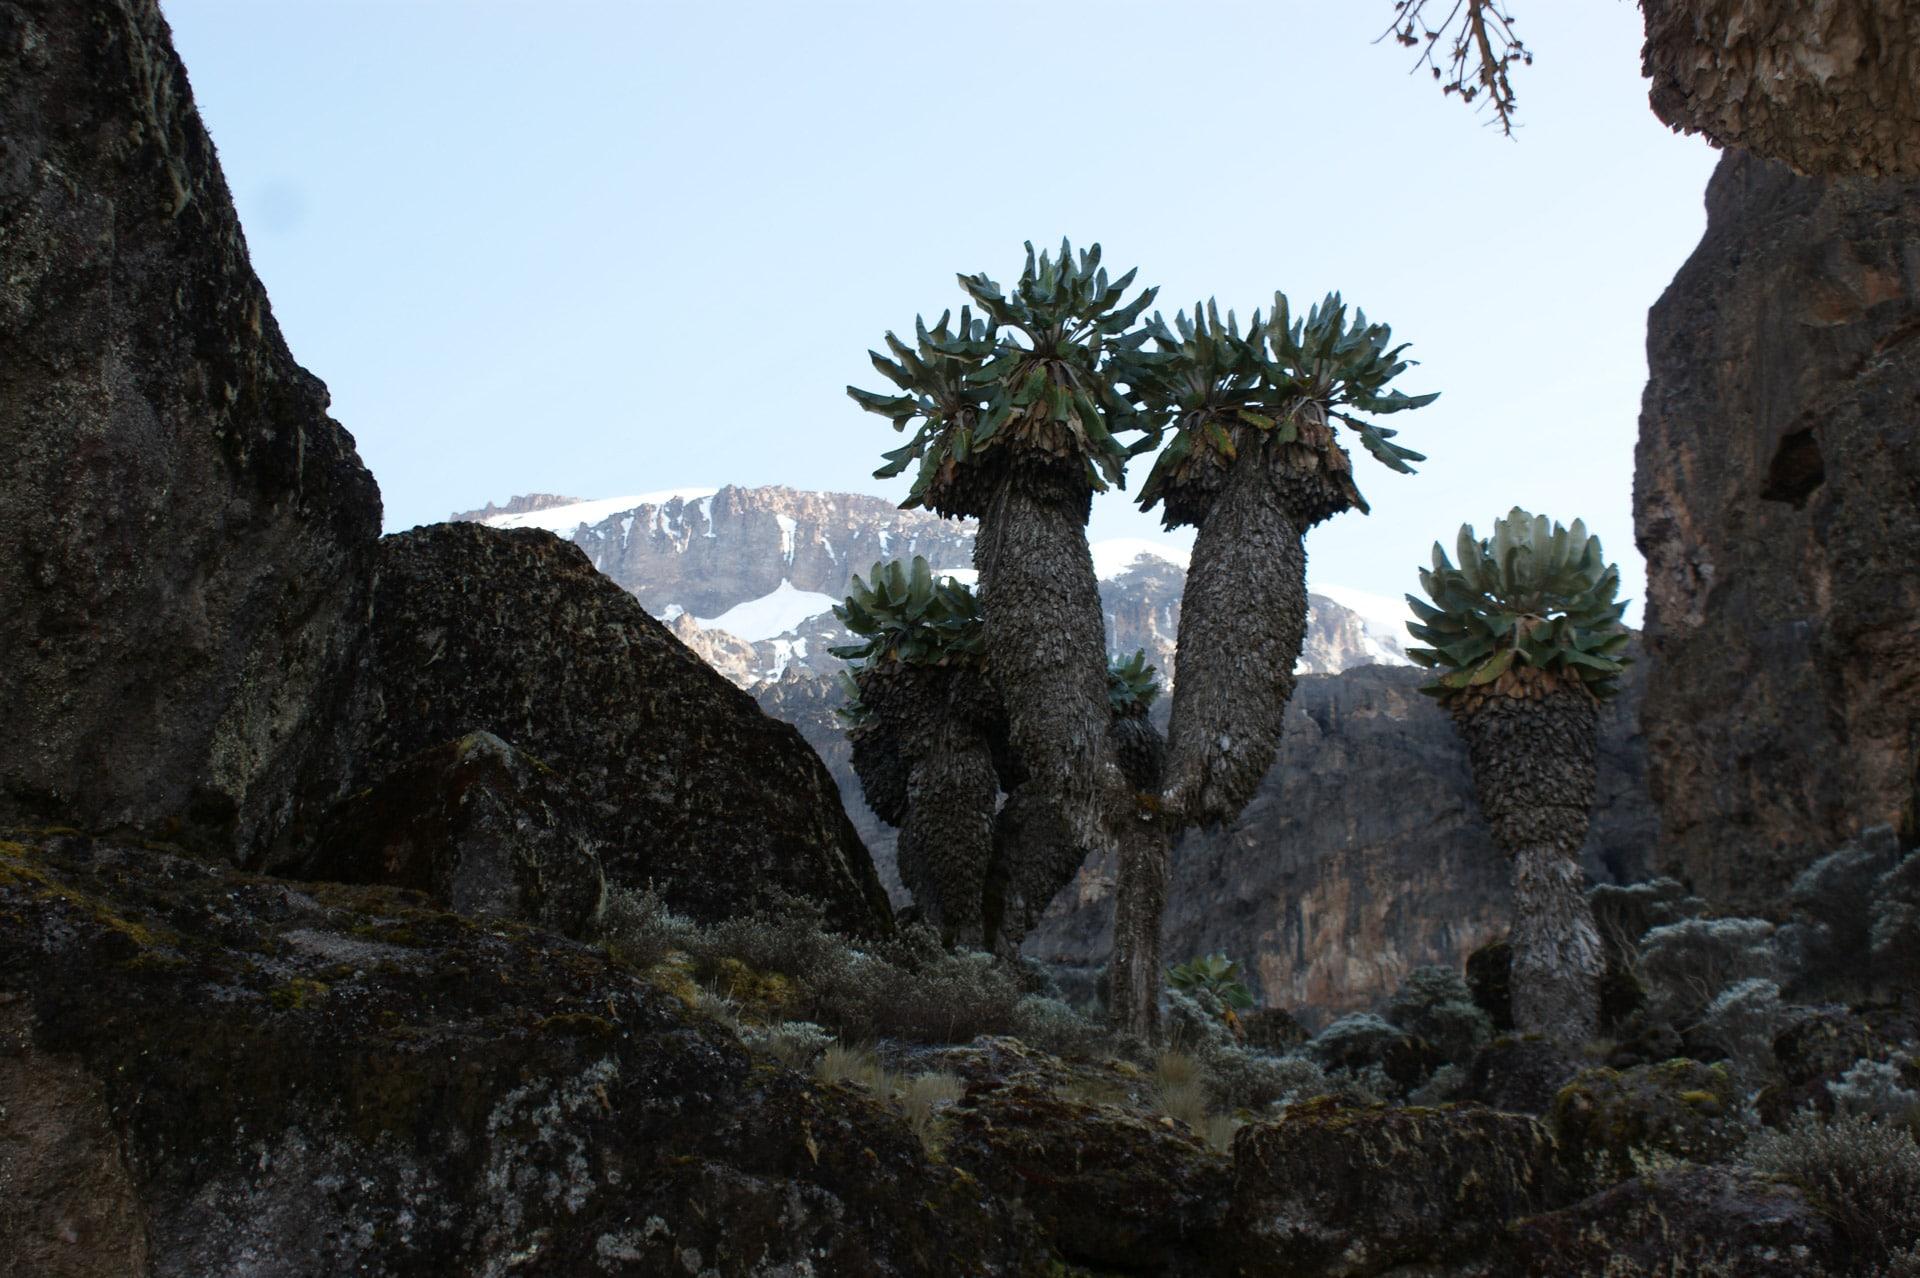 Kilimanjaro-Tansania-Globetrotter-Select-Krause-08